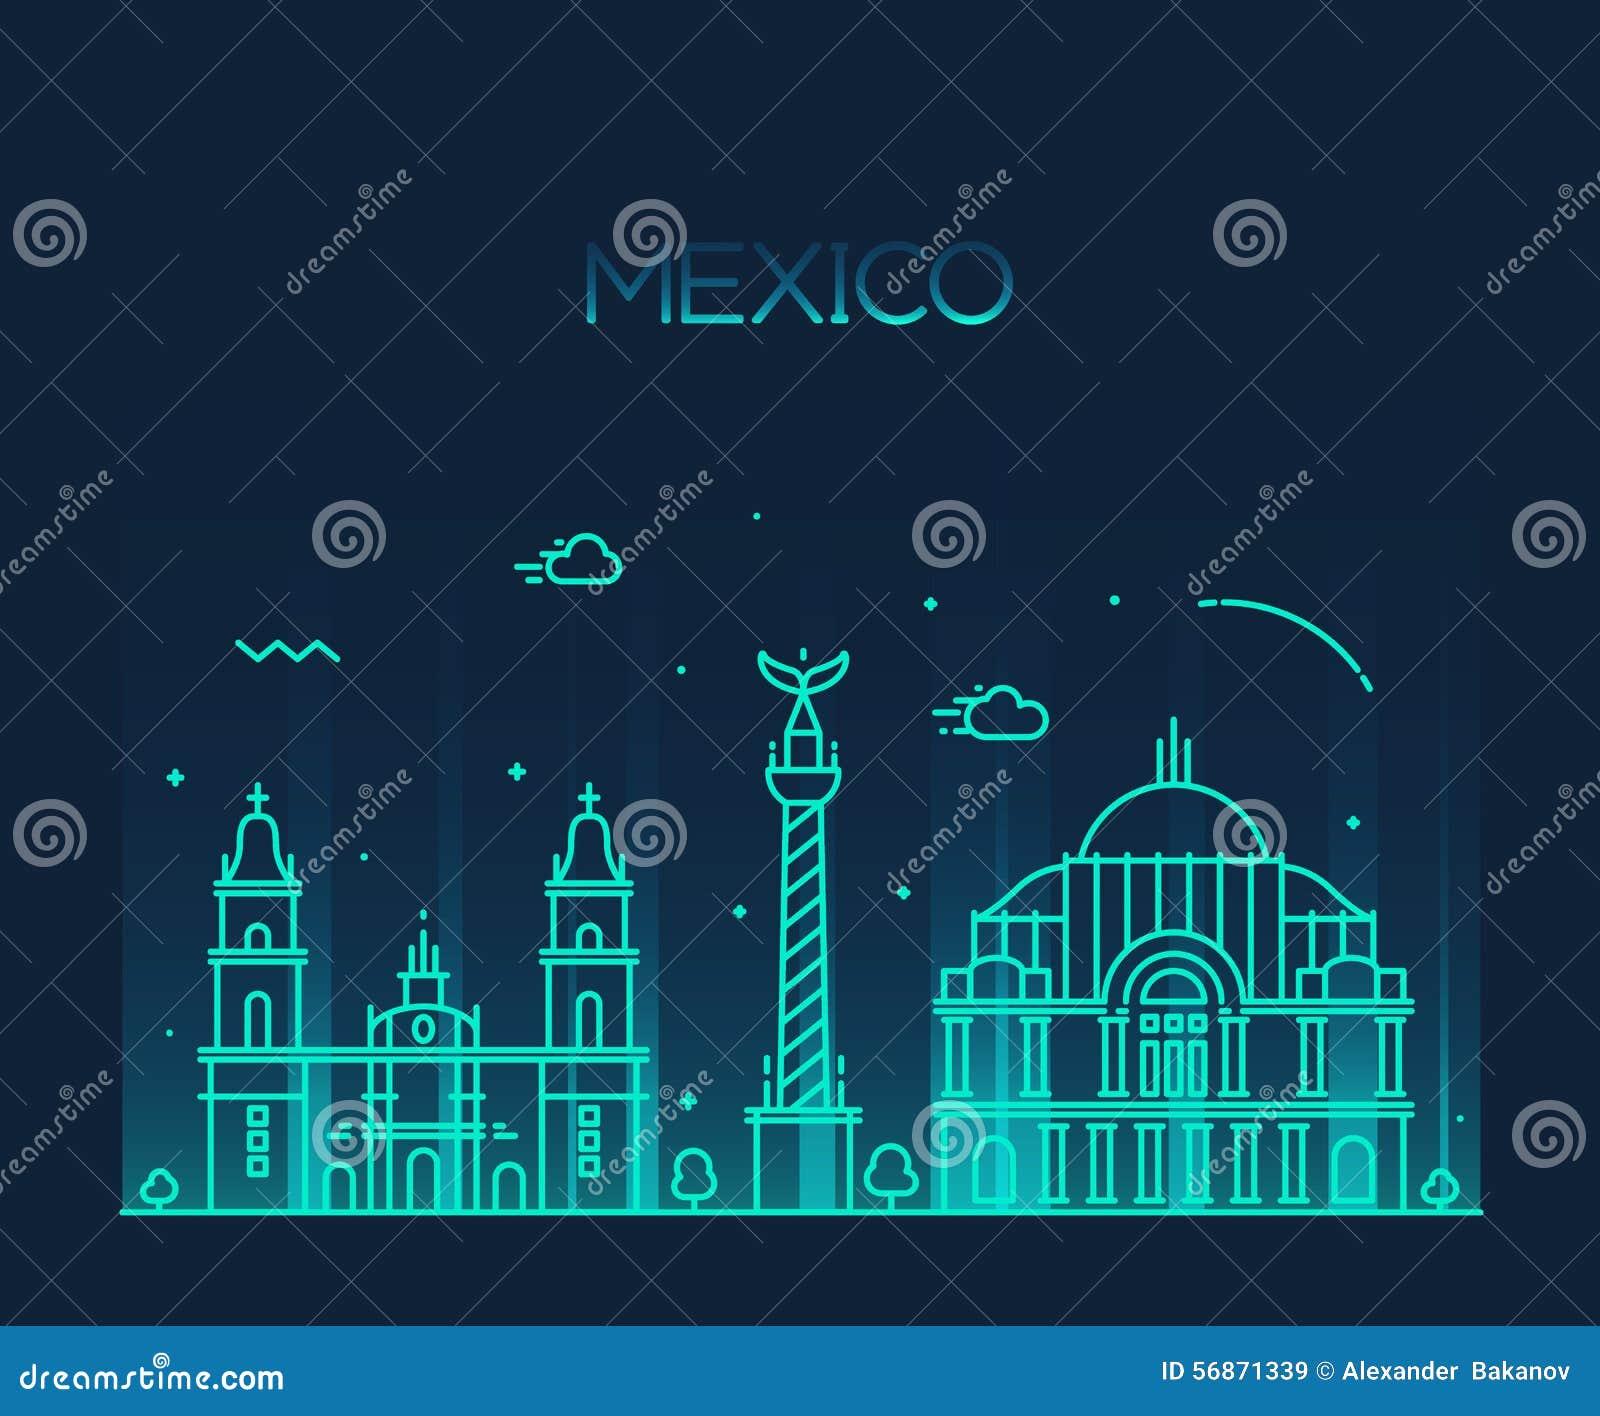 Mexico City Skyline Trendy Vector Line Art Style Stock